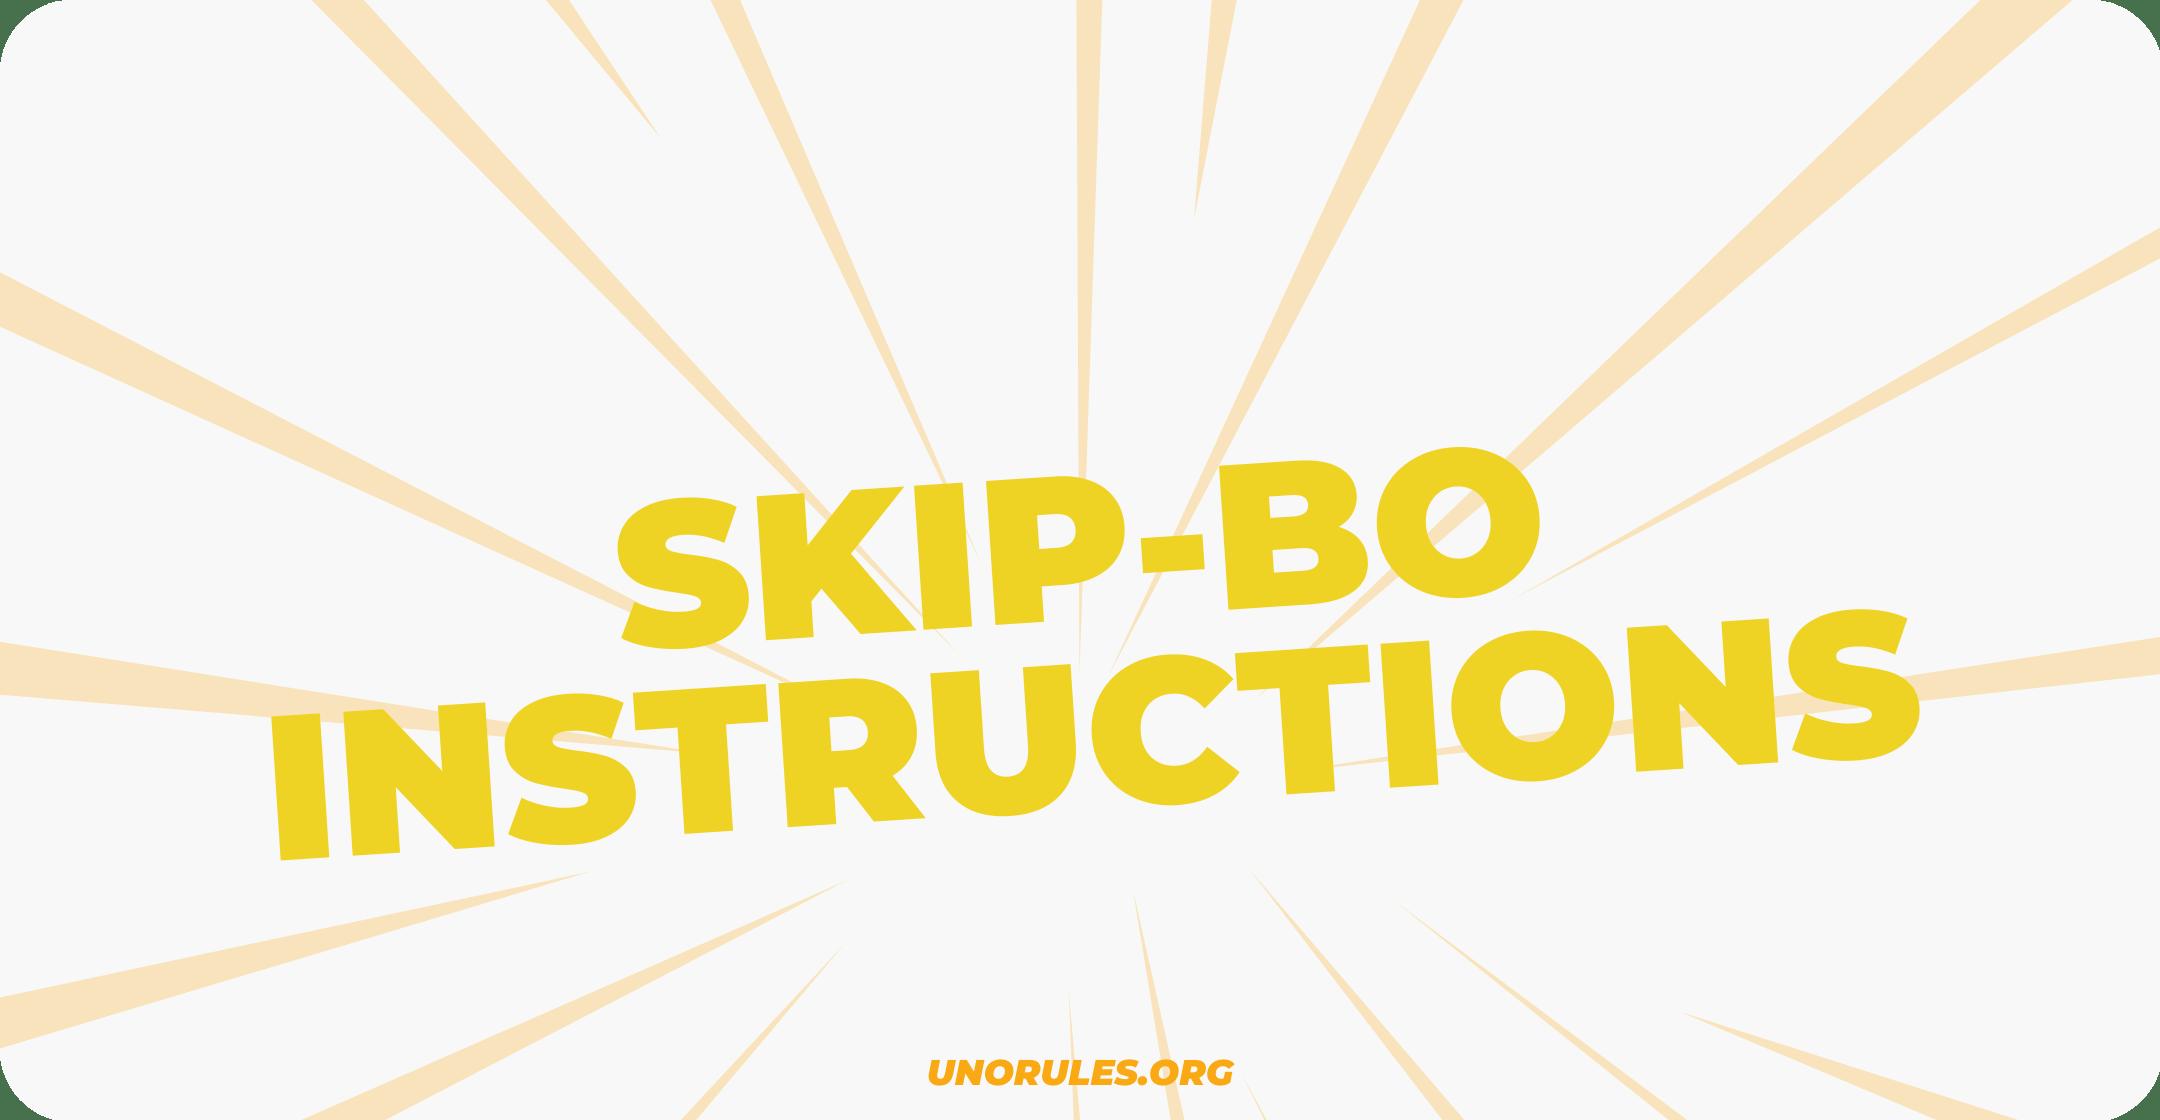 Skip-Bo instructions